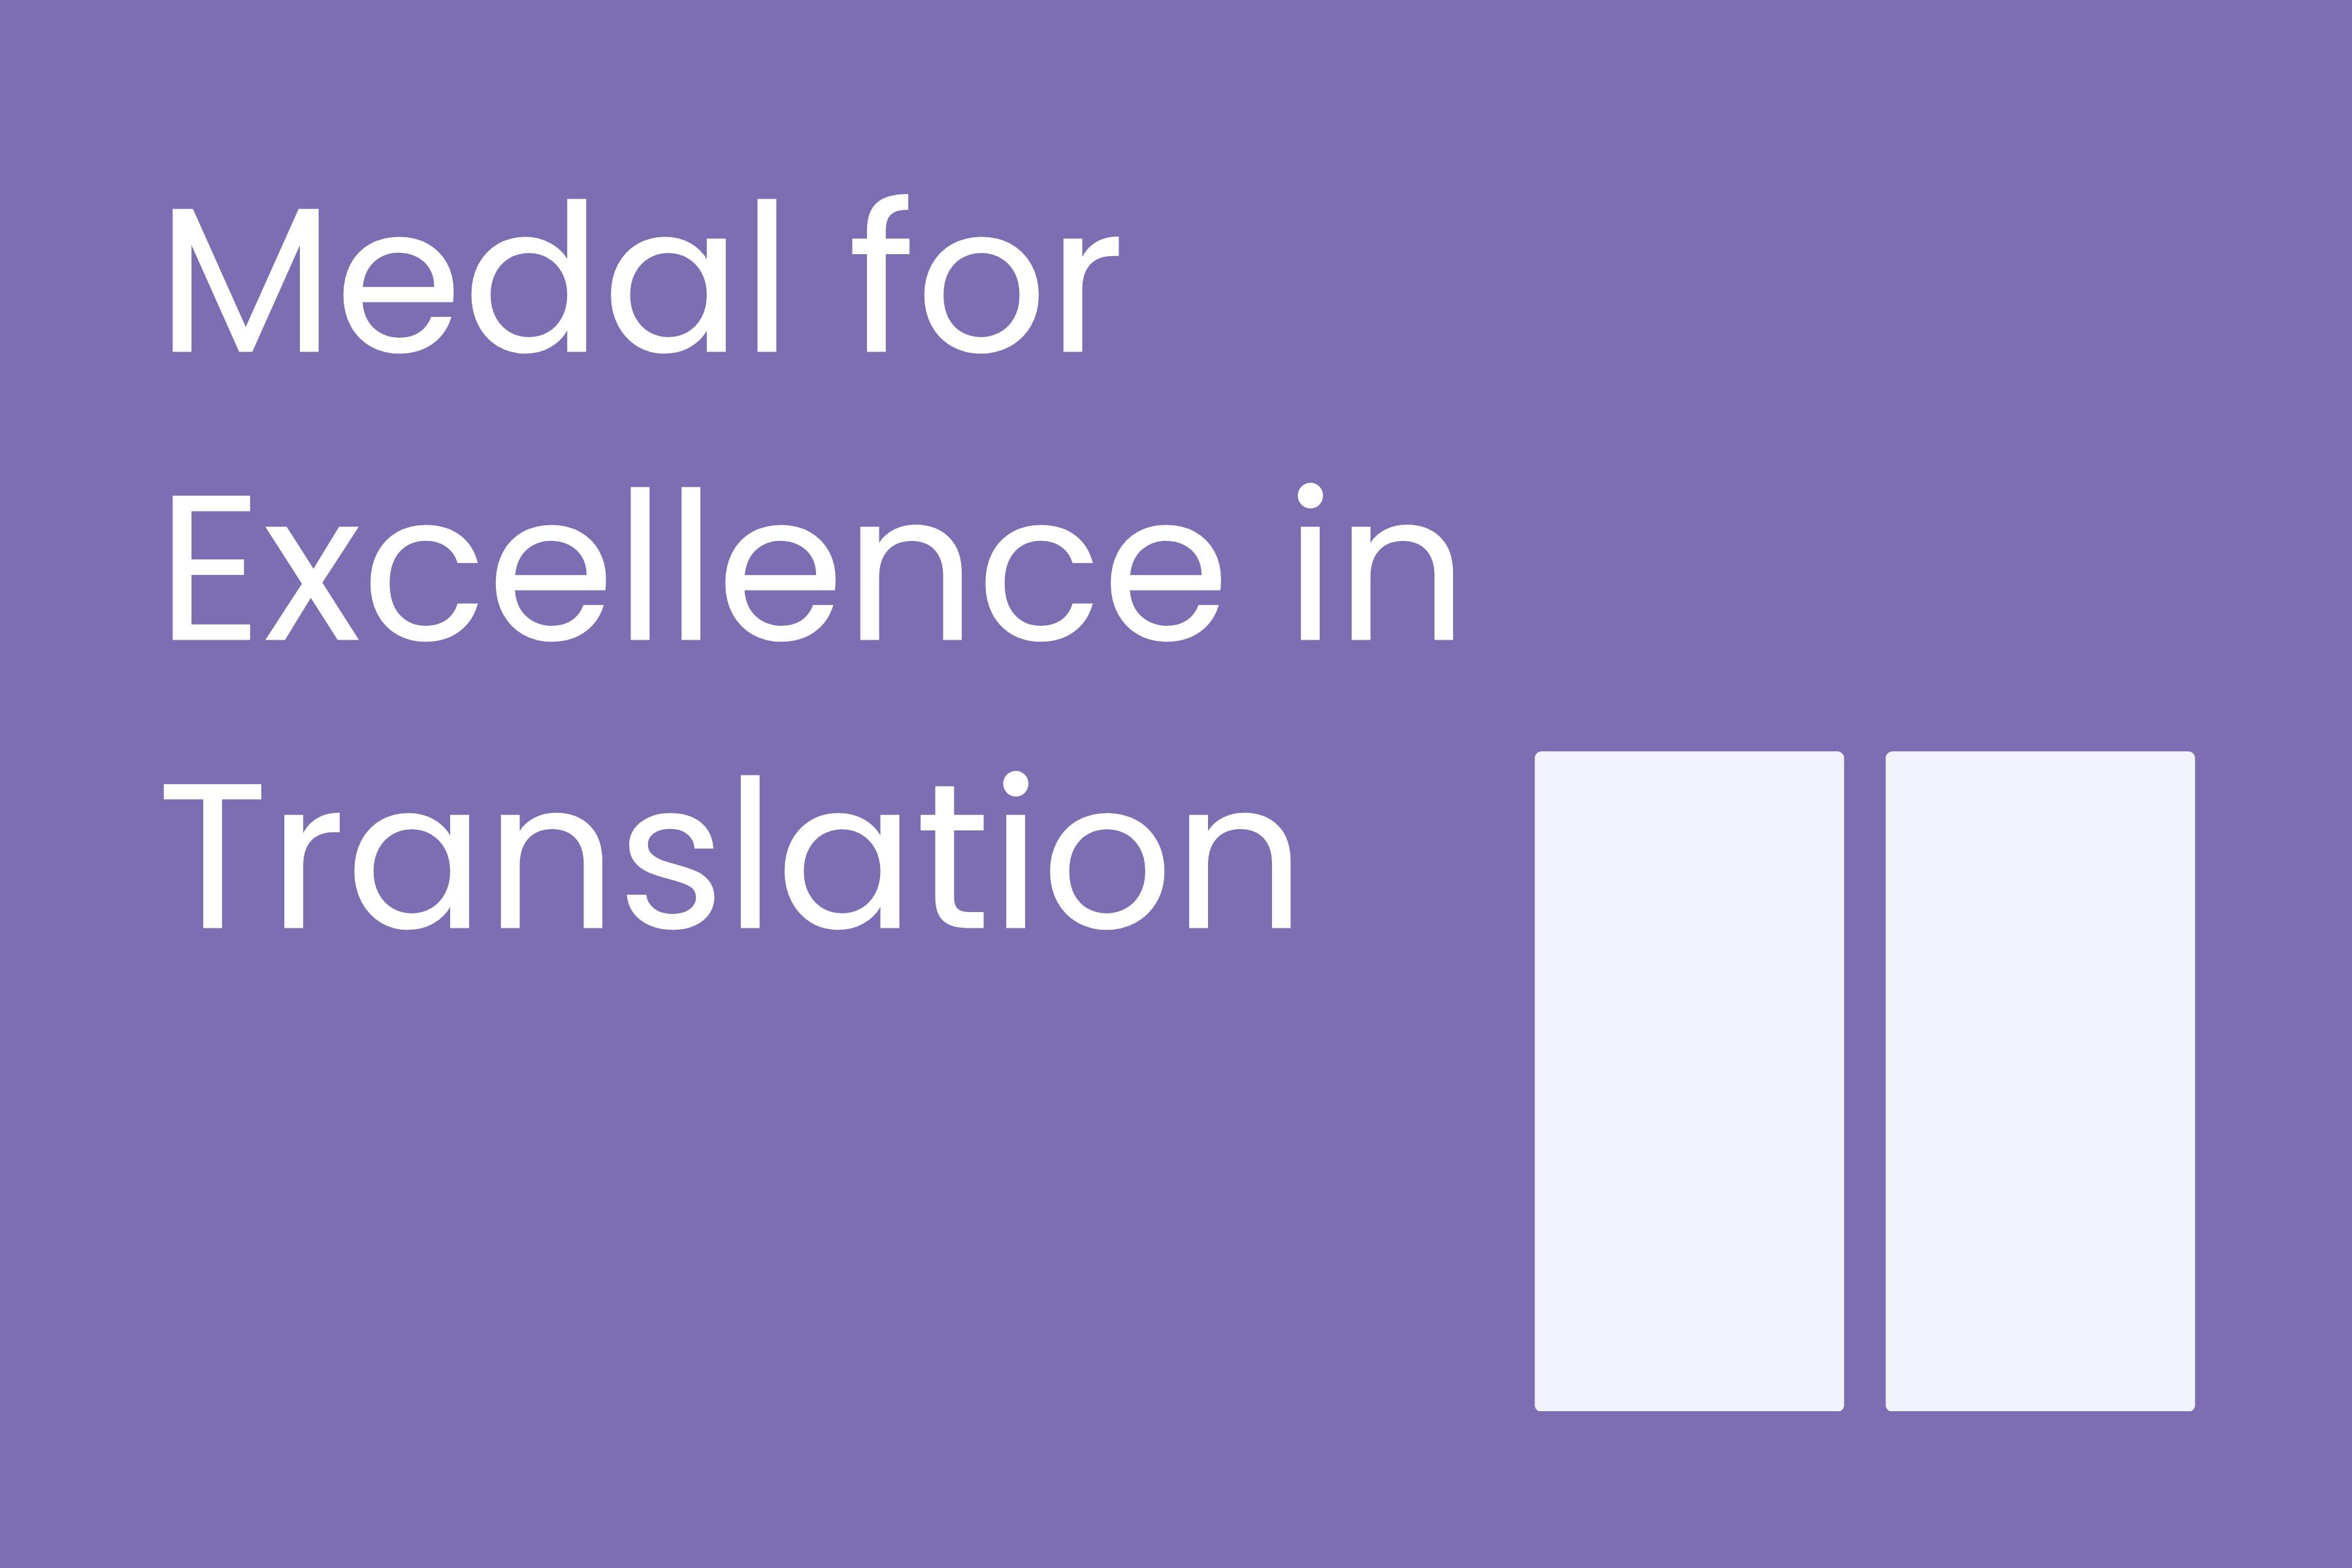 Medal for Excellence in Translation